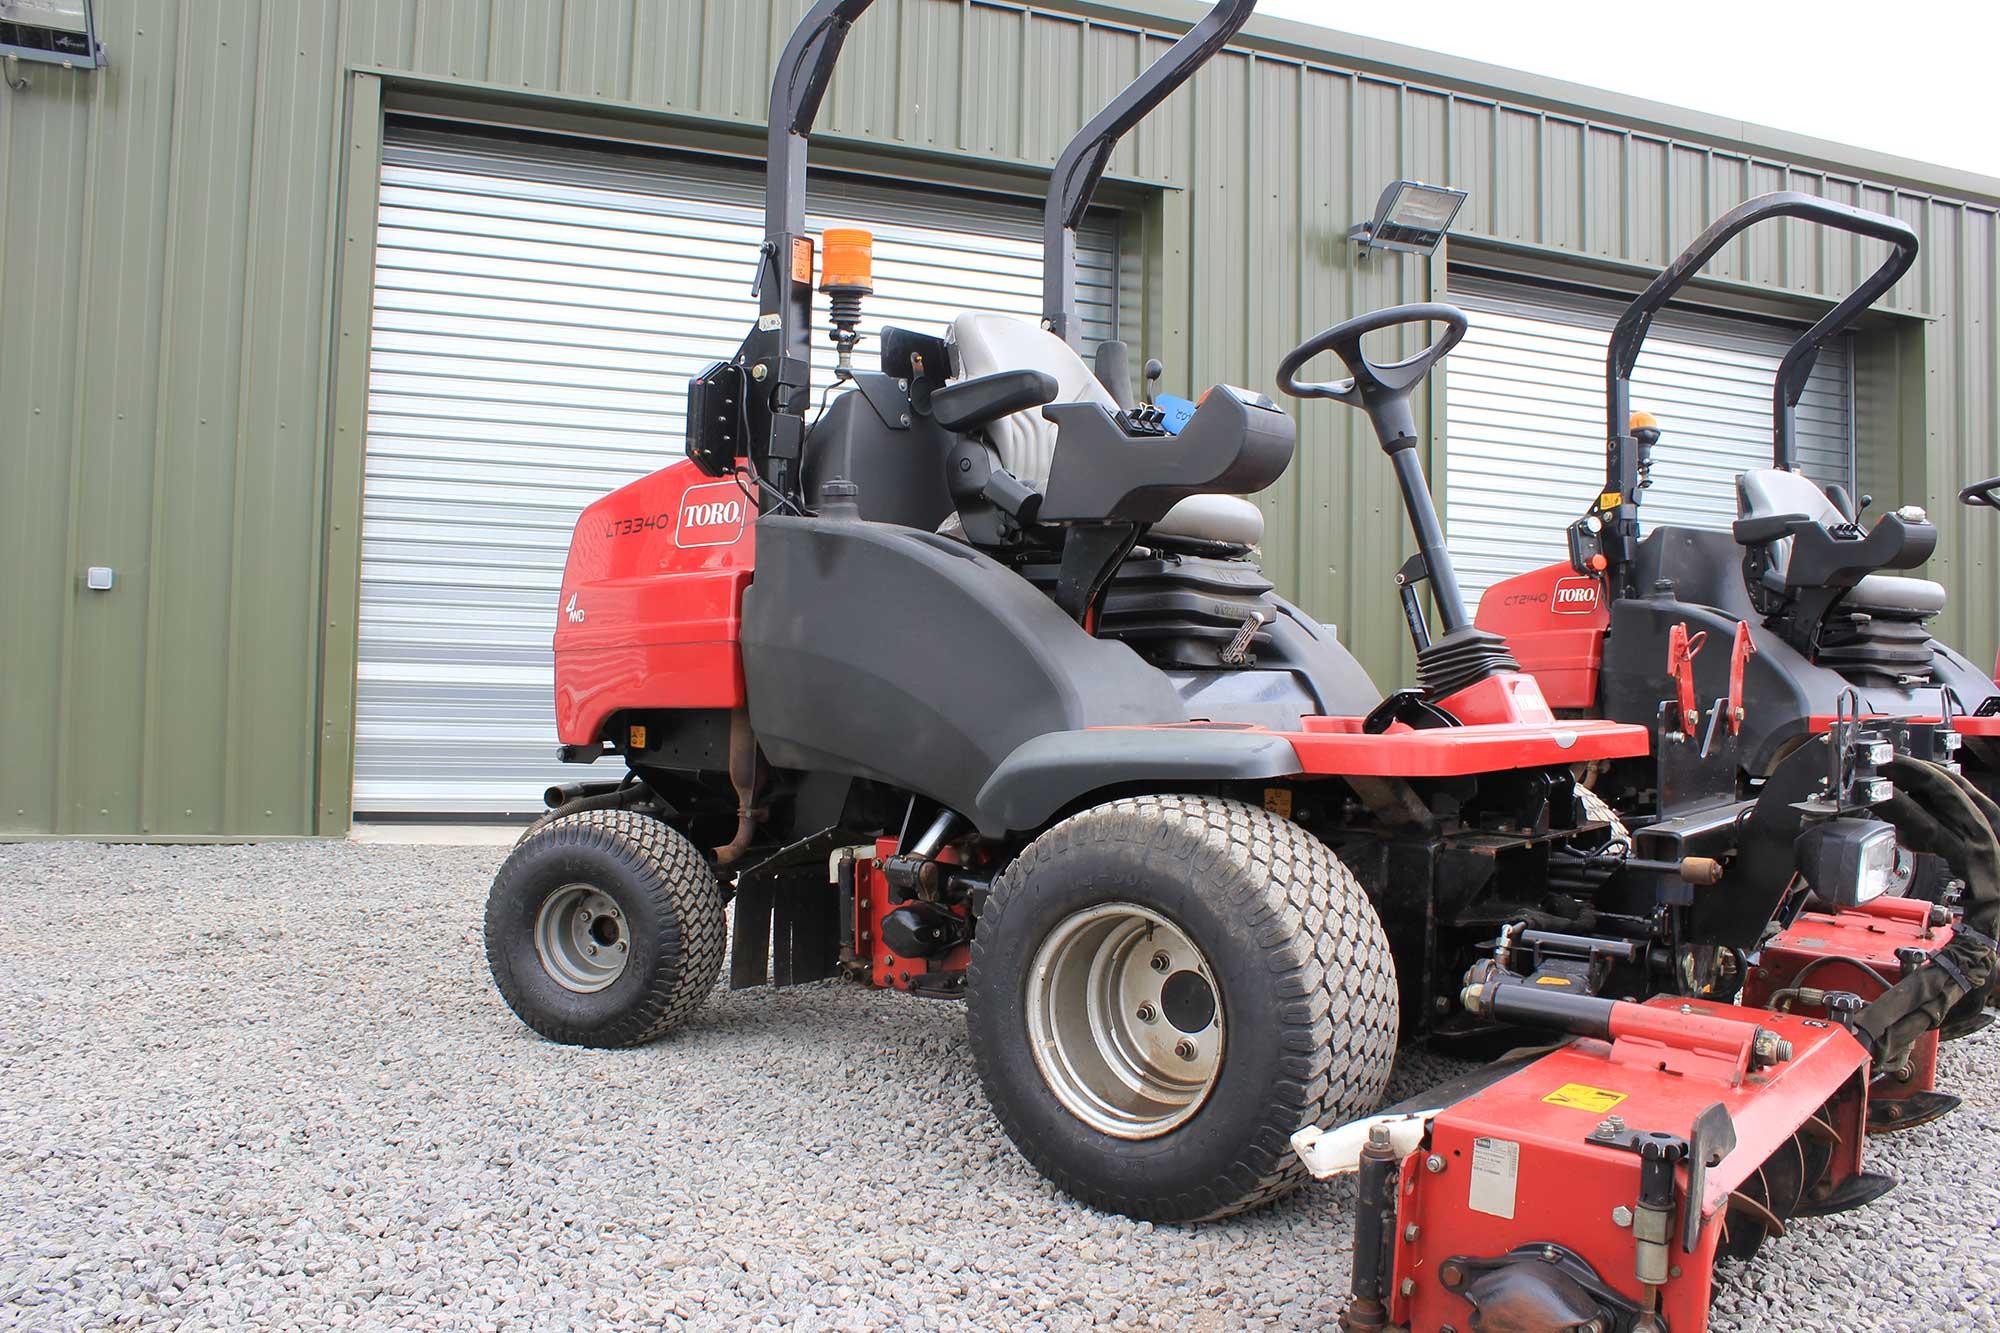 Toro Finish Mower : Toro lt cylinder mower for sale fineturf